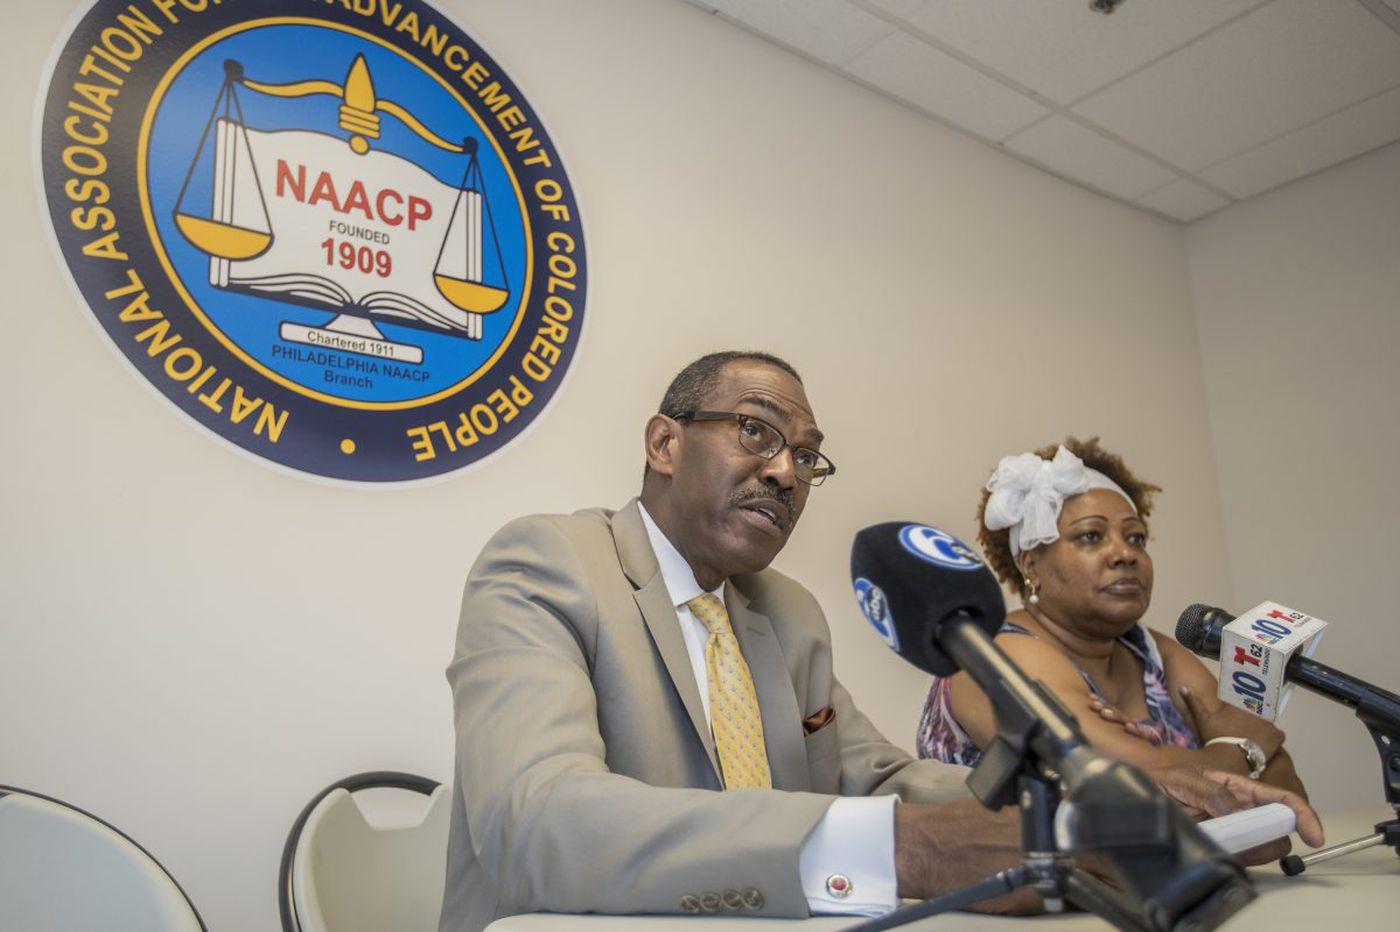 NAACP: Former DA Abraham unfit 'menace' for post